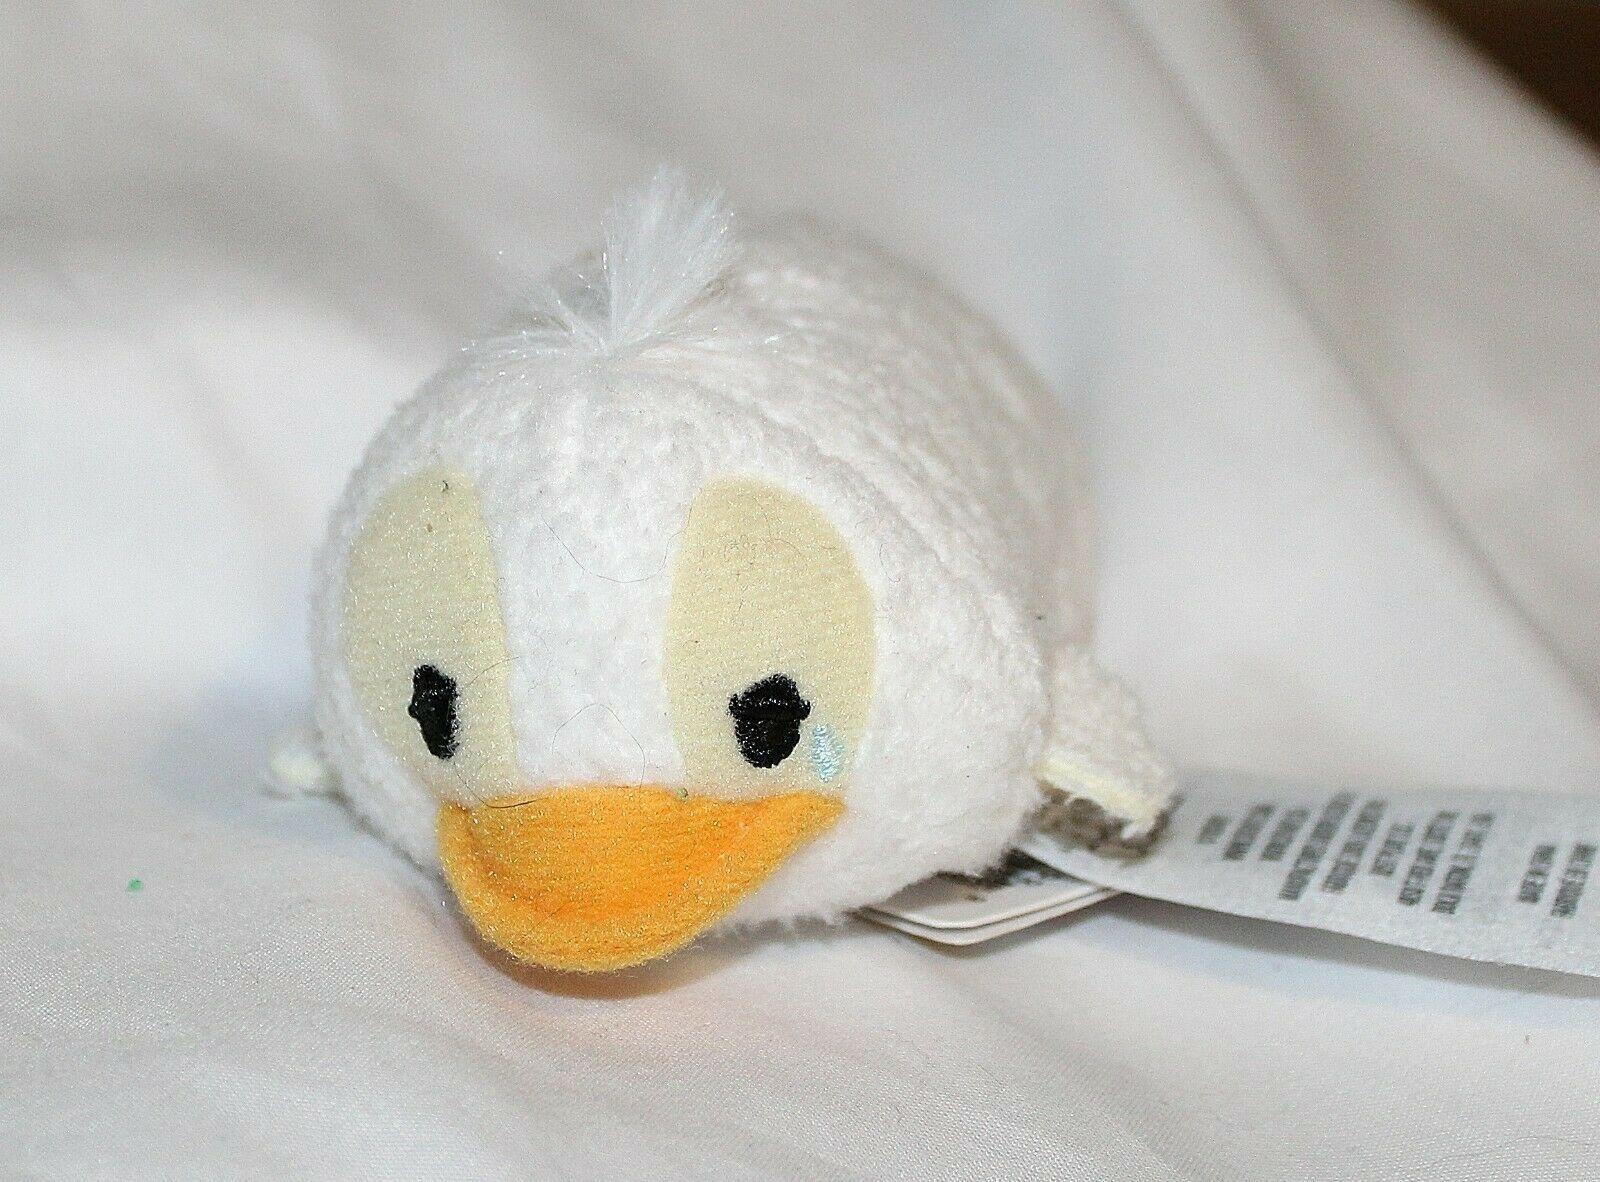 New Disney Tsum Tsum Ugly Duckling Plush Lilo & Stitch Stuffed Animal